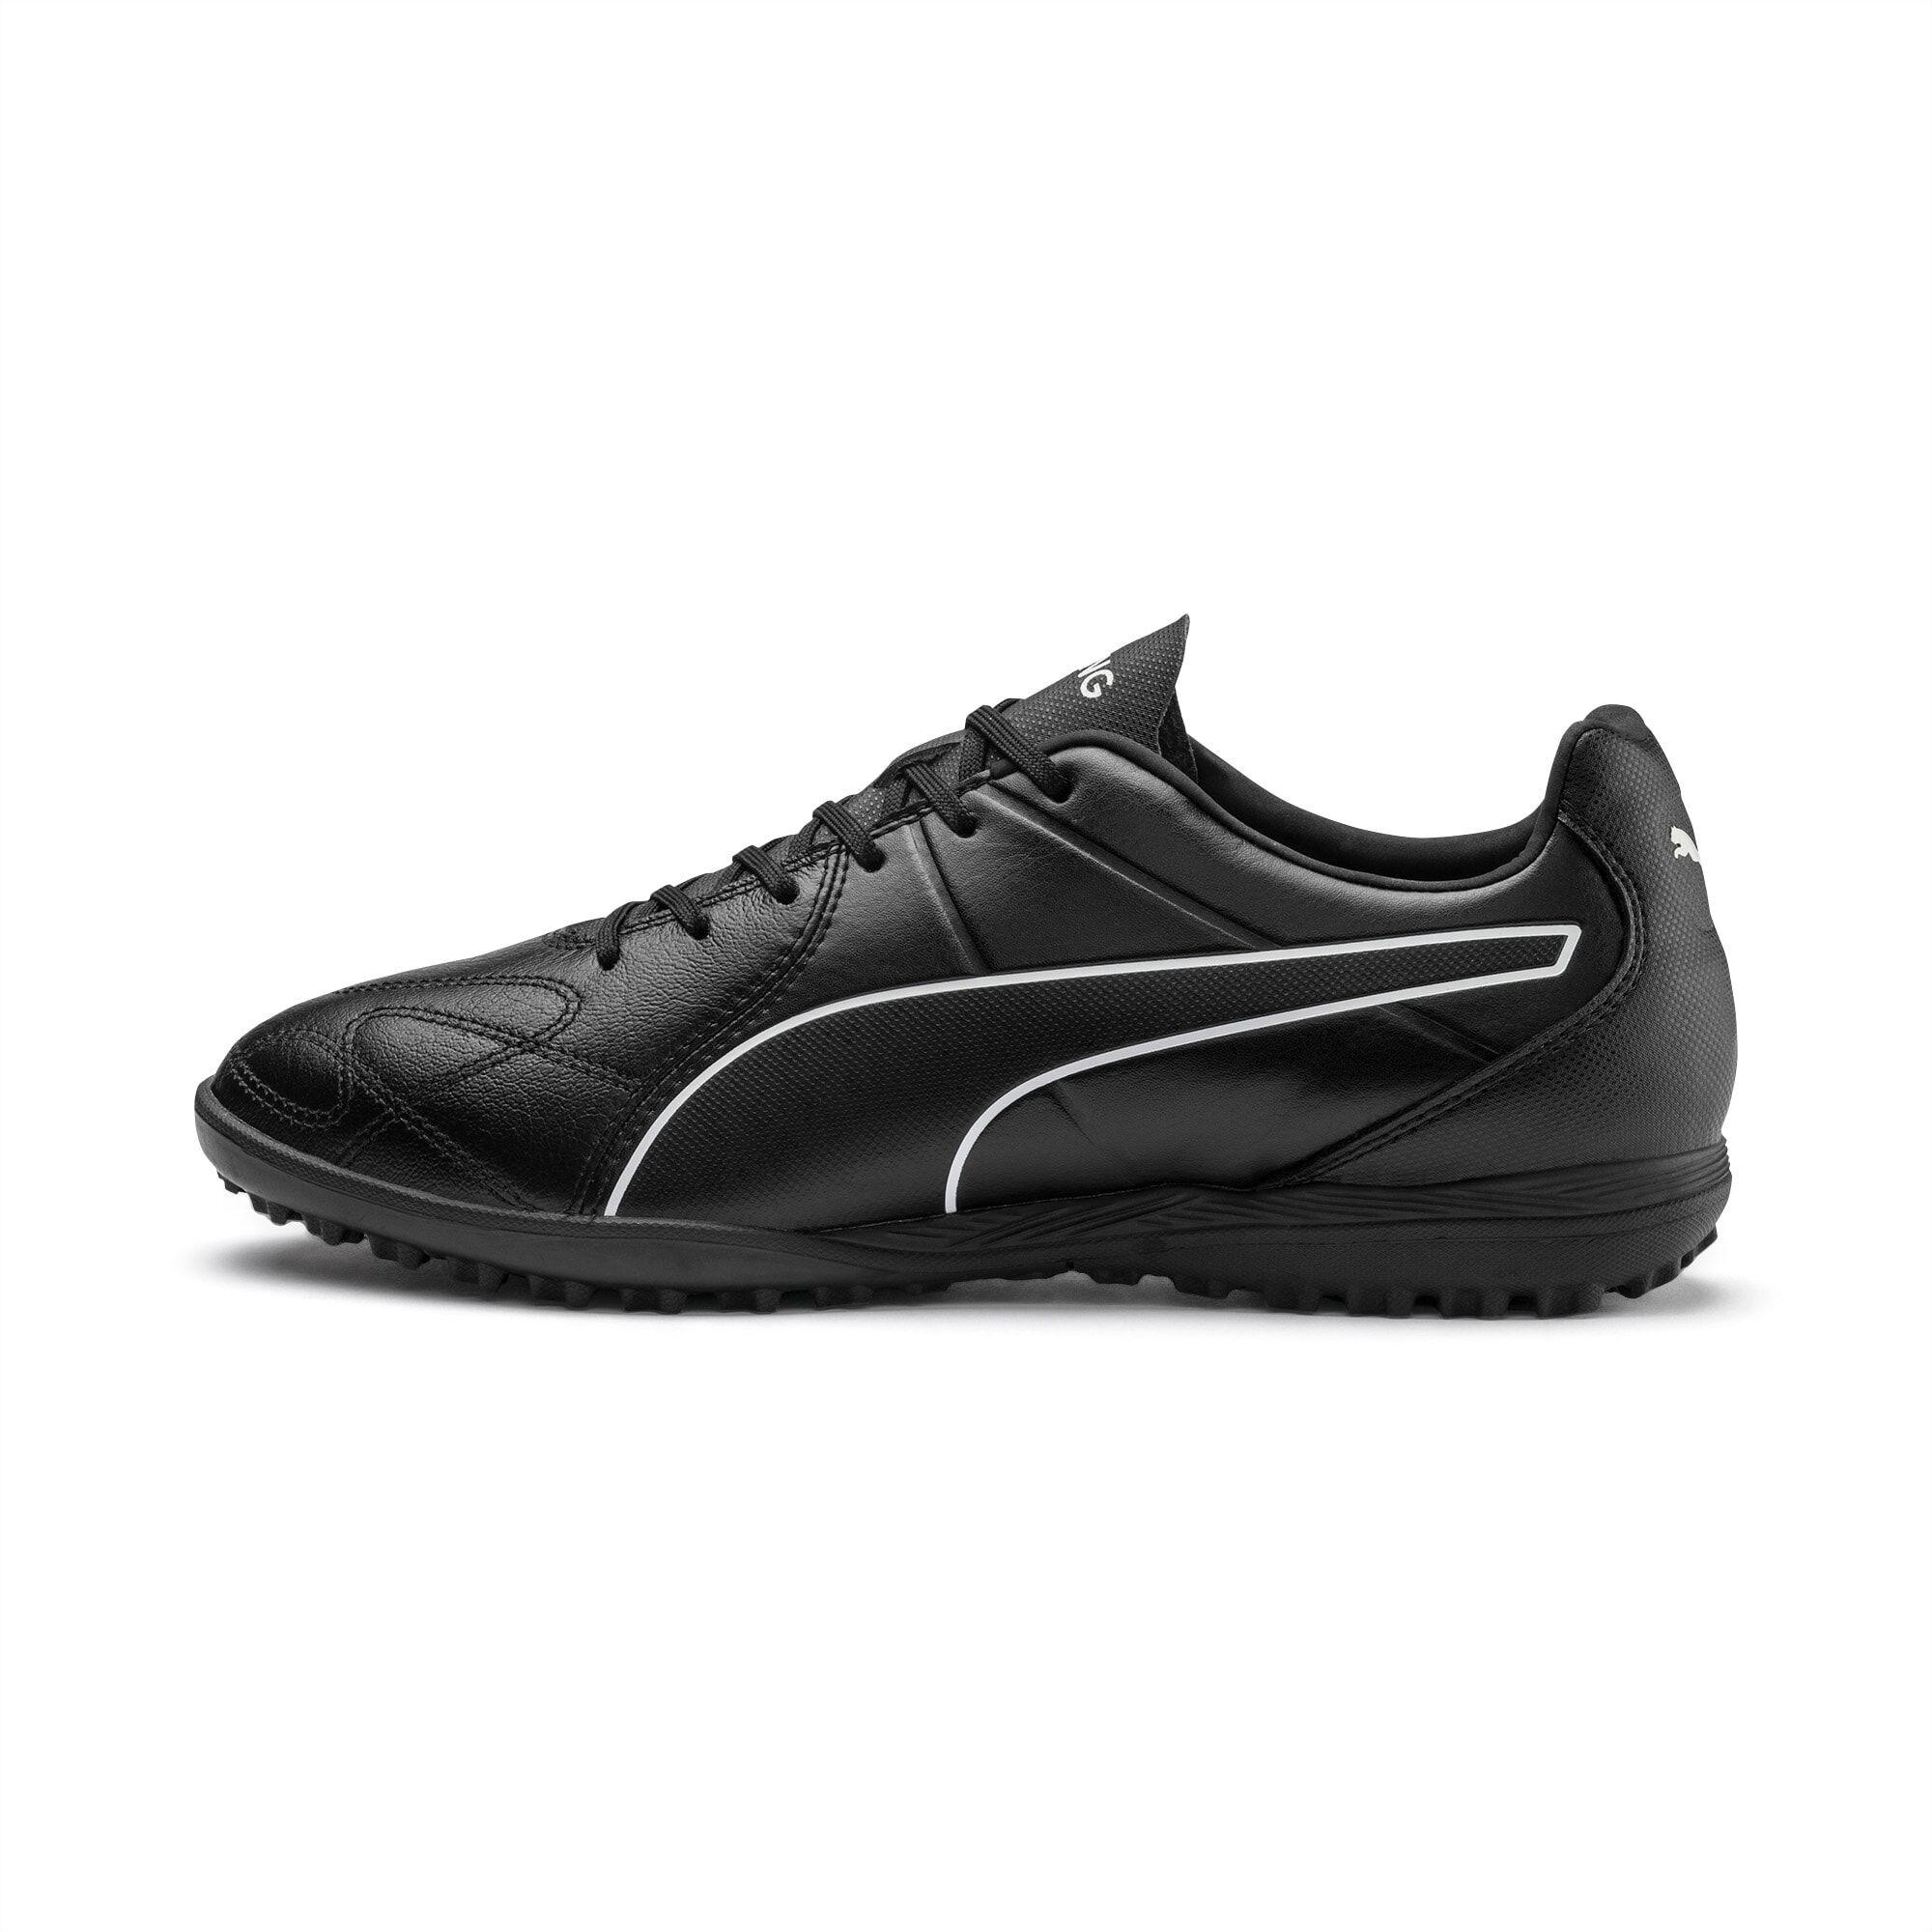 PUMA Chaussure de foot KING Hero TT, Noir/Blanc, Taille 35.5, Accessoires